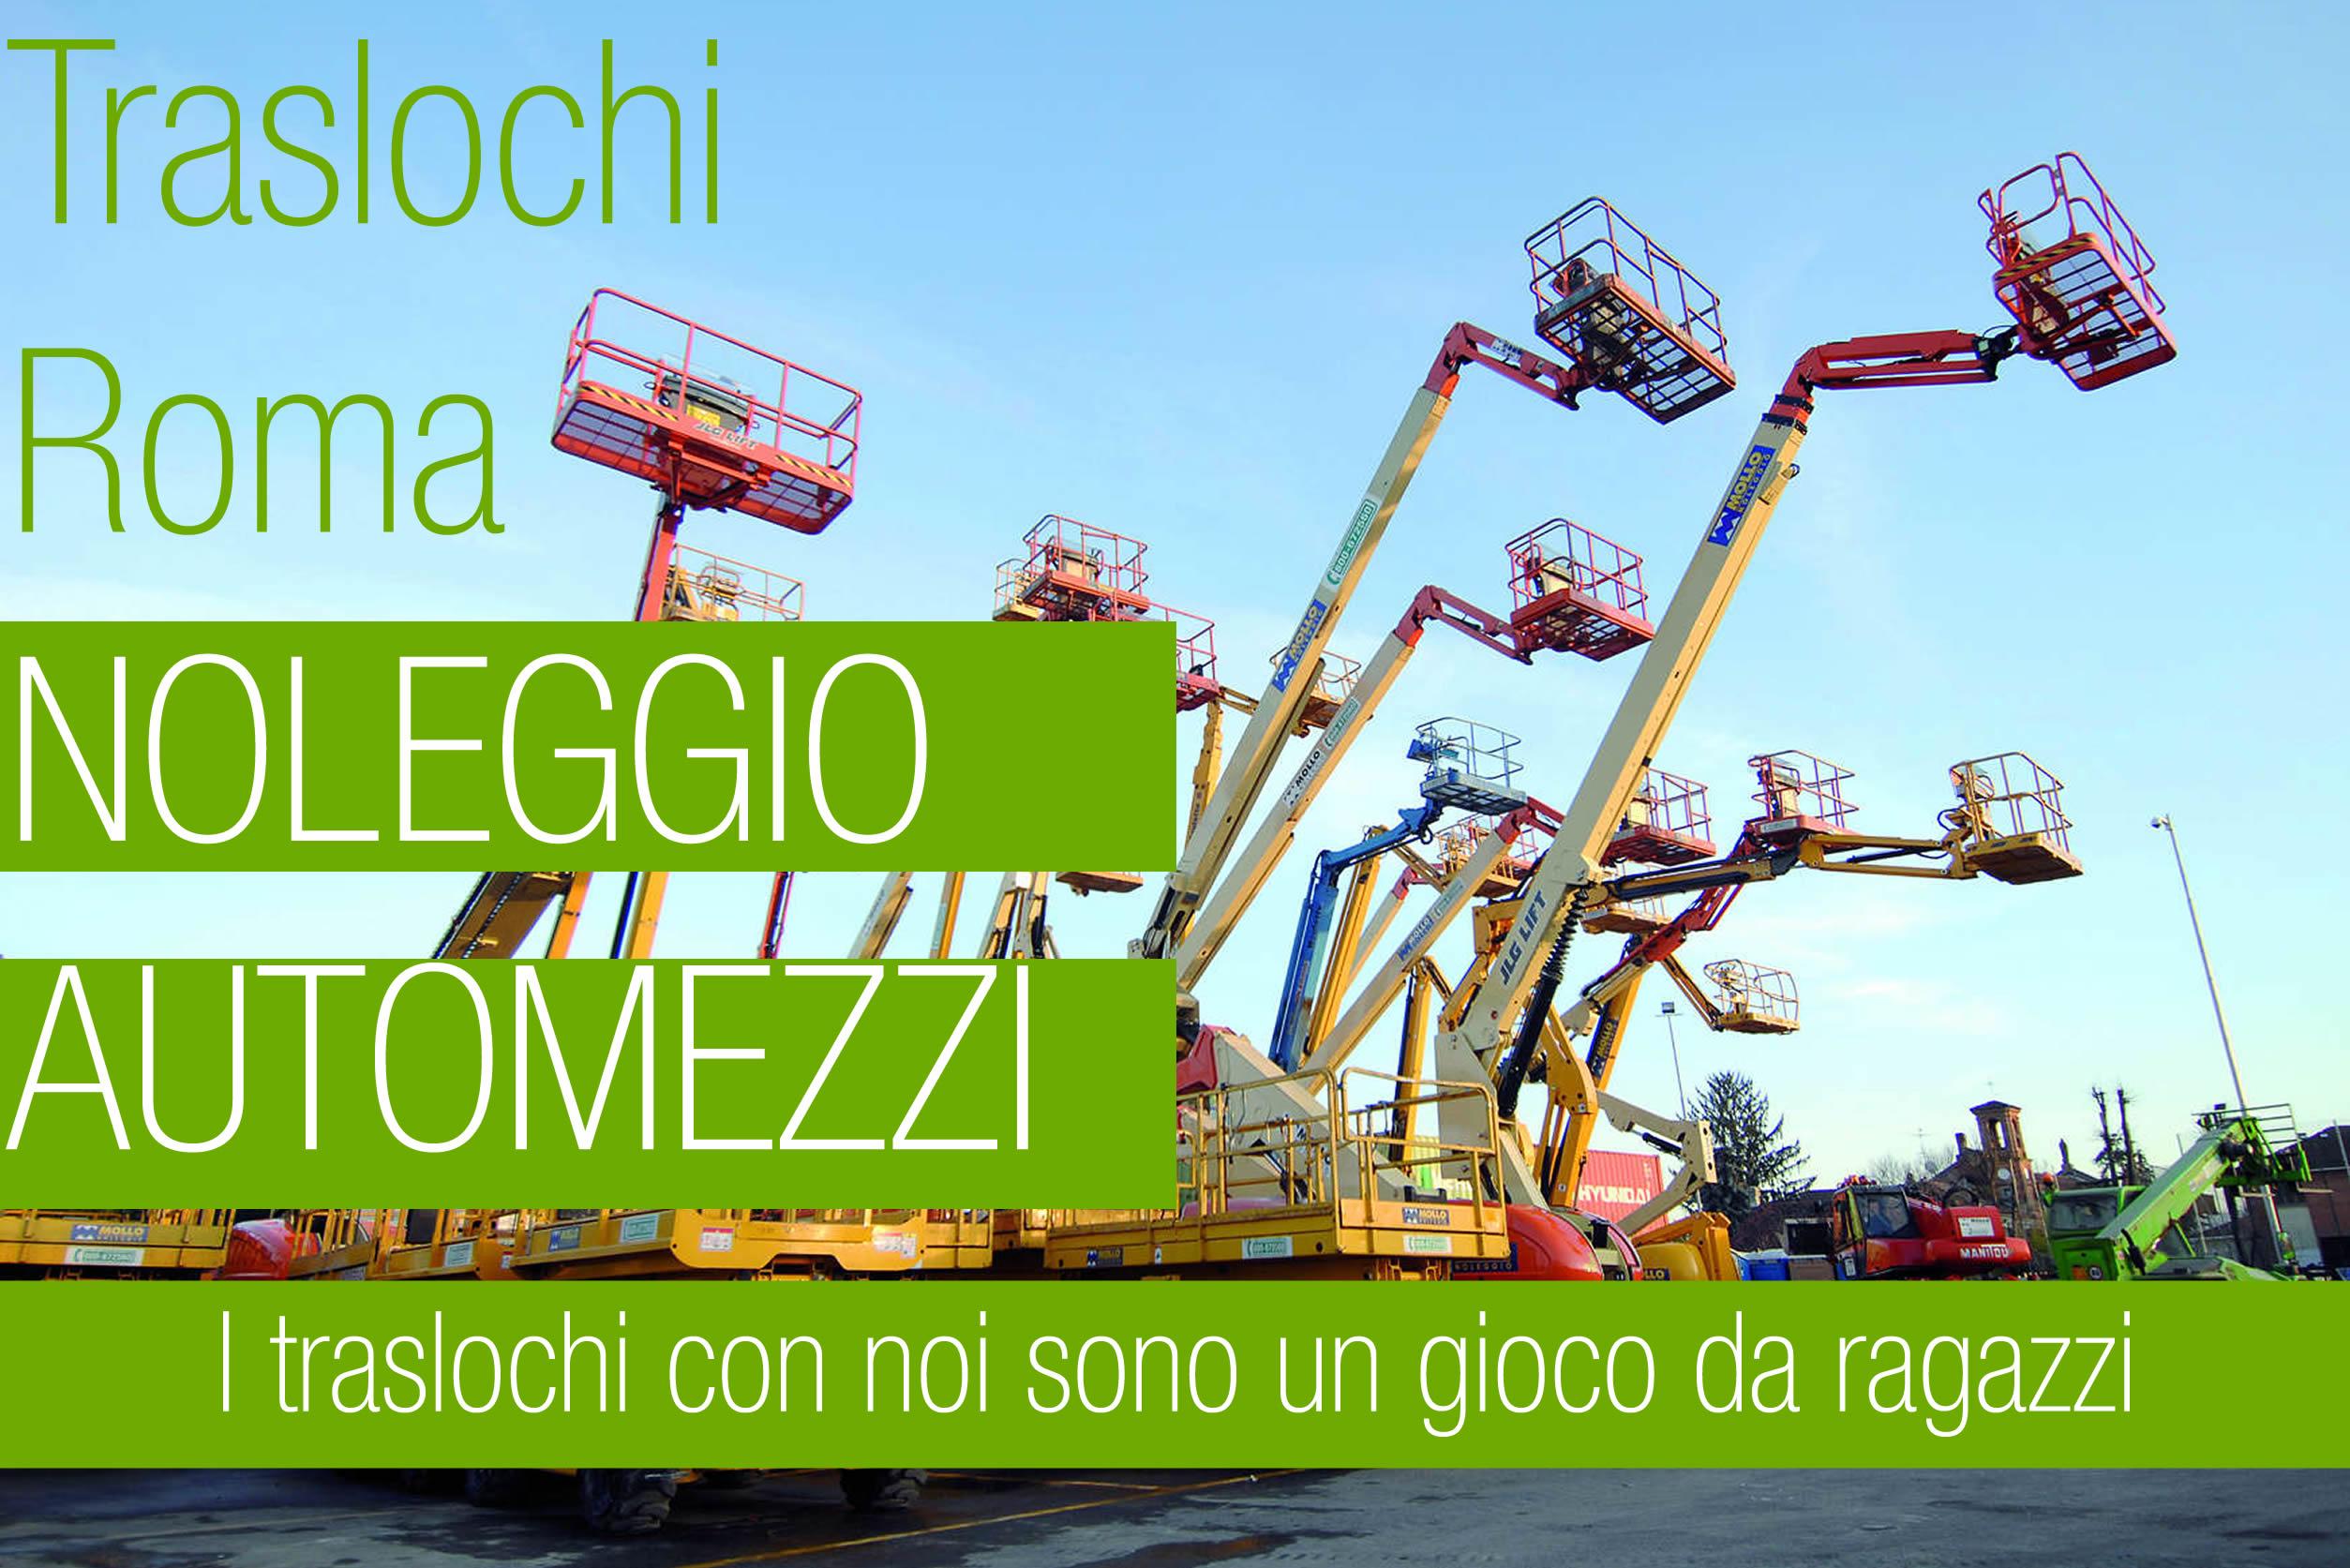 Noleggio Scala Montacarichi Appio Pignatelli - Noleggio a Appio Pignatelli. Contattaci ora per avere tutte le informazioni inerenti a Noleggio Scala Montacarichi Appio Pignatelli, risponderemo il prima possibile.